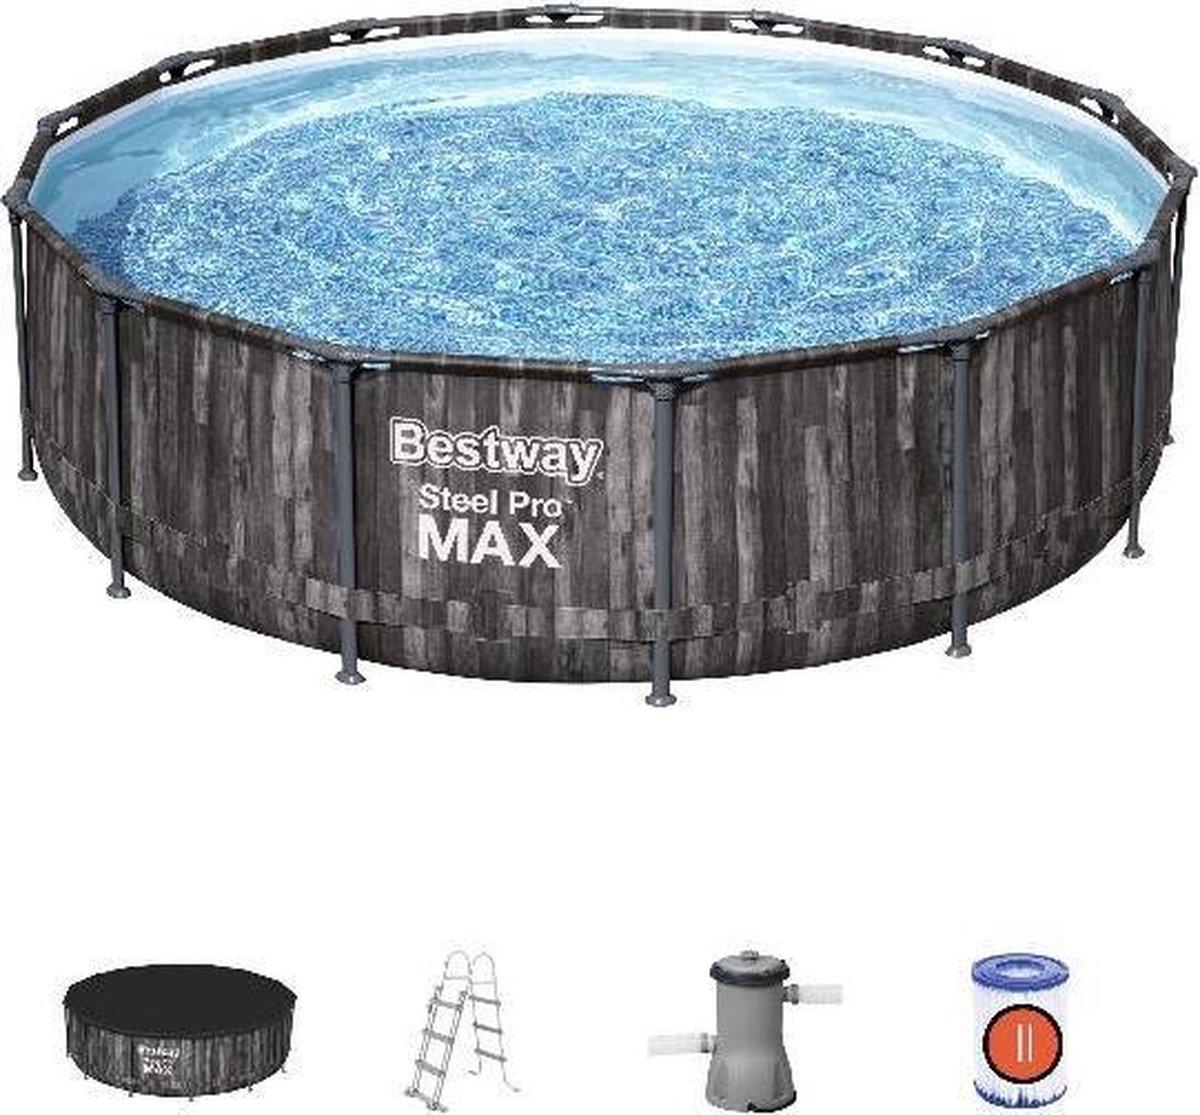 Bestway zwembad steel pro max set rond hout 427